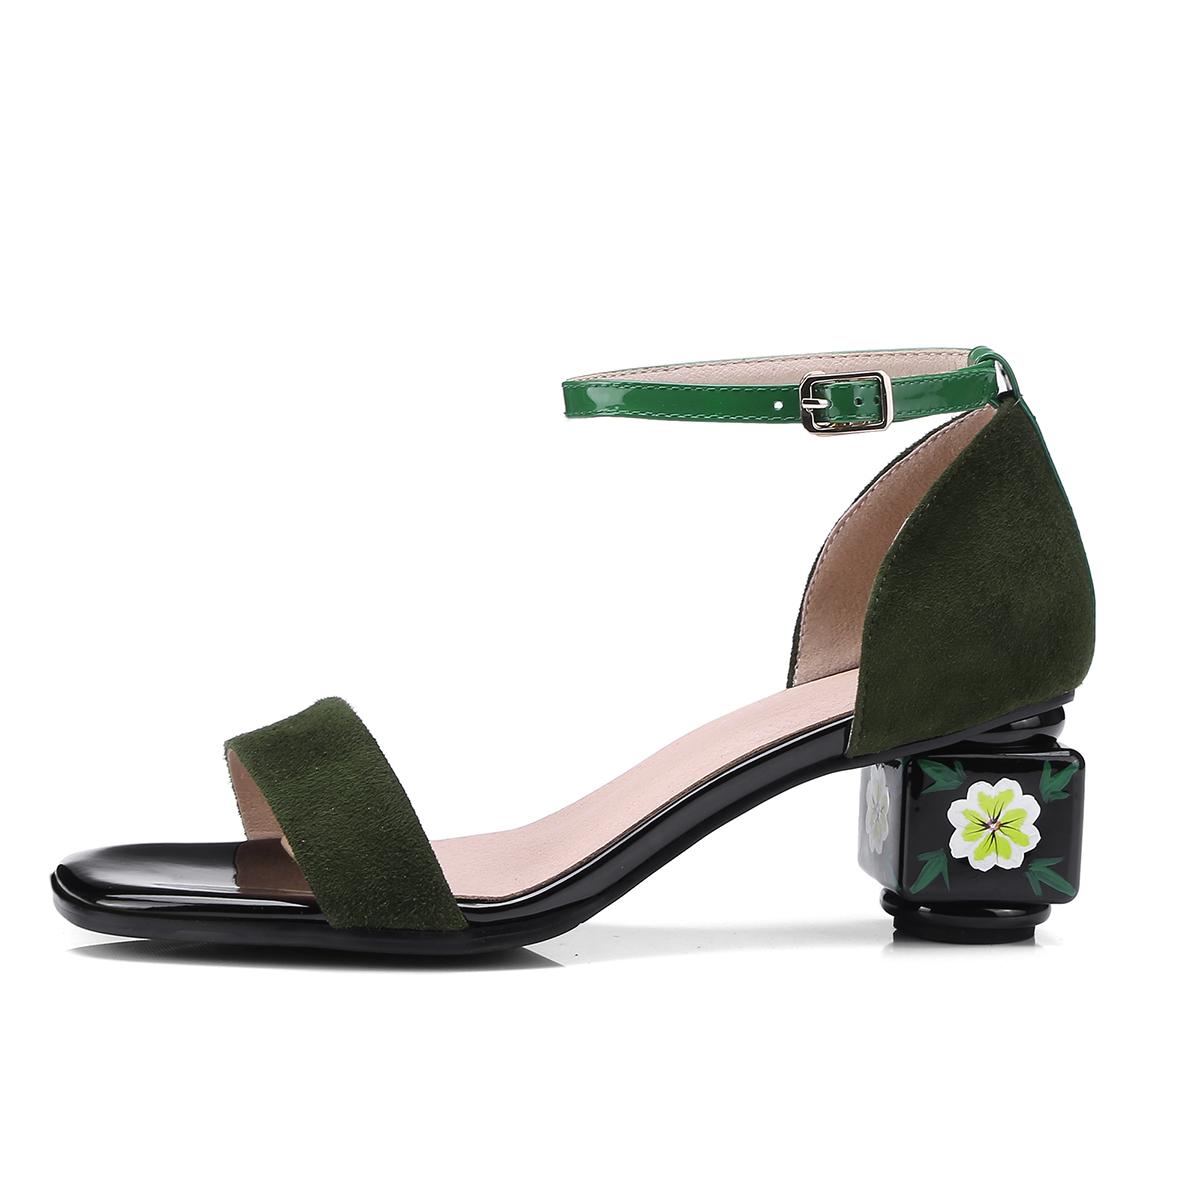 US  60 - Arden Furtado 2018 summer high heels 5cm ankle strap big size  40-43 fashion sandals shoes for woman flower heels strange heels -  www.ardenfurtado. ... 76c622ef0057